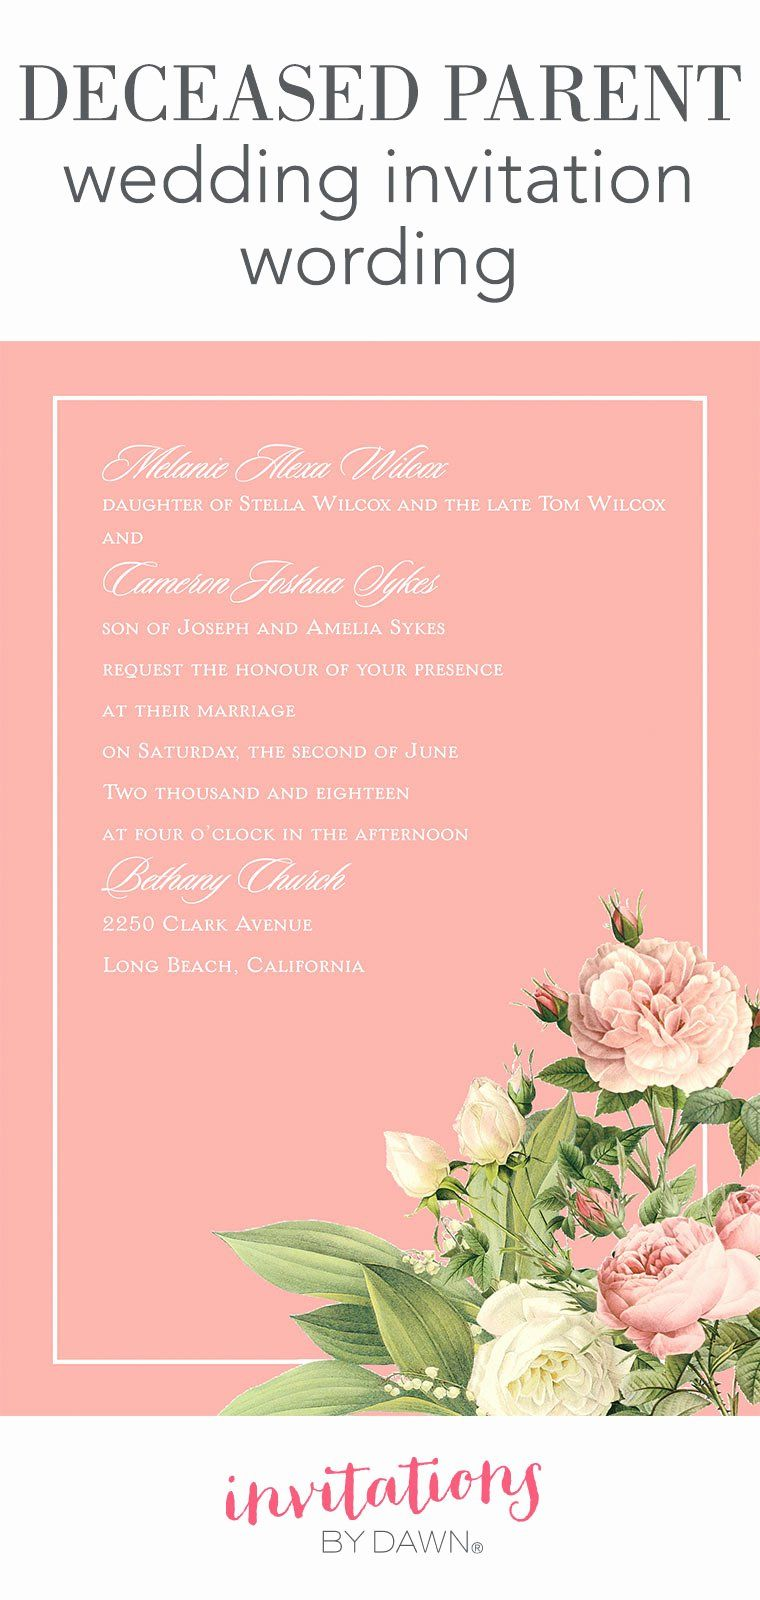 Wedding Invitation From Child Wording Luxury Deceased Parent Wedding Invitati In 2020 Wedding Invitation Message Sample Wedding Invitation Wording Marriage Invitations